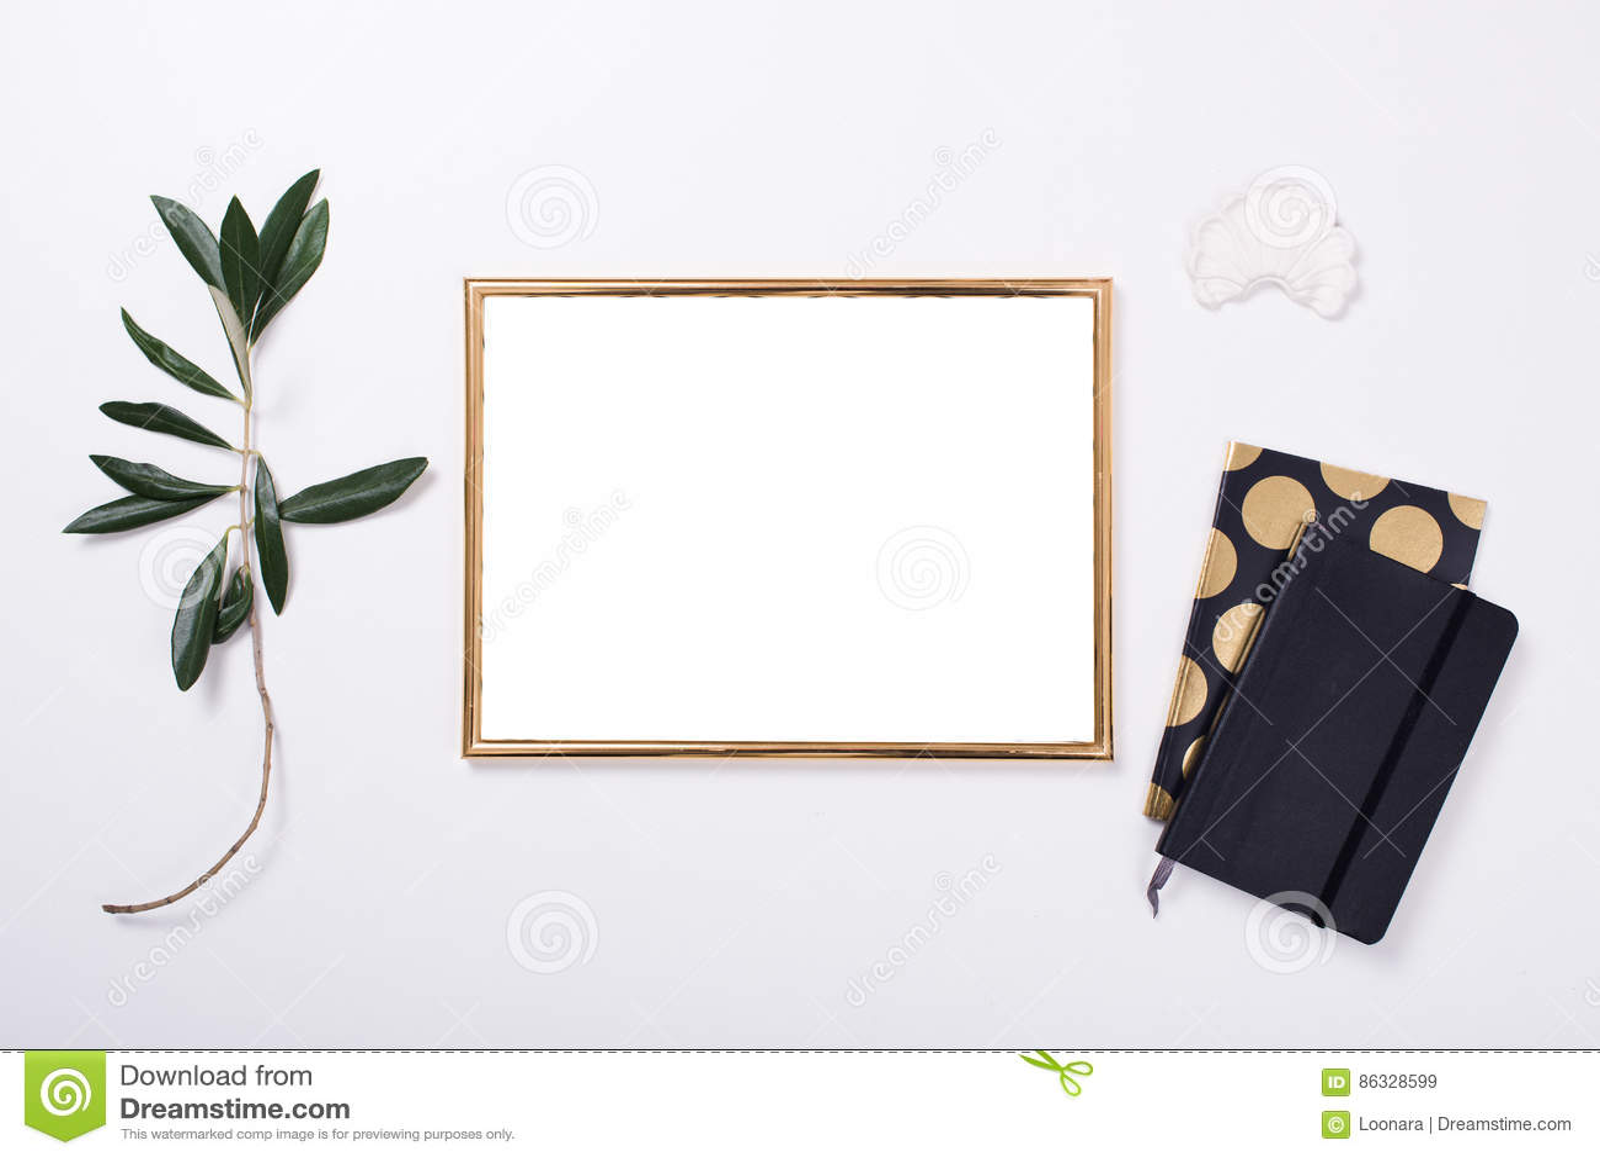 Modelo dourado do quadro no tabletop branco